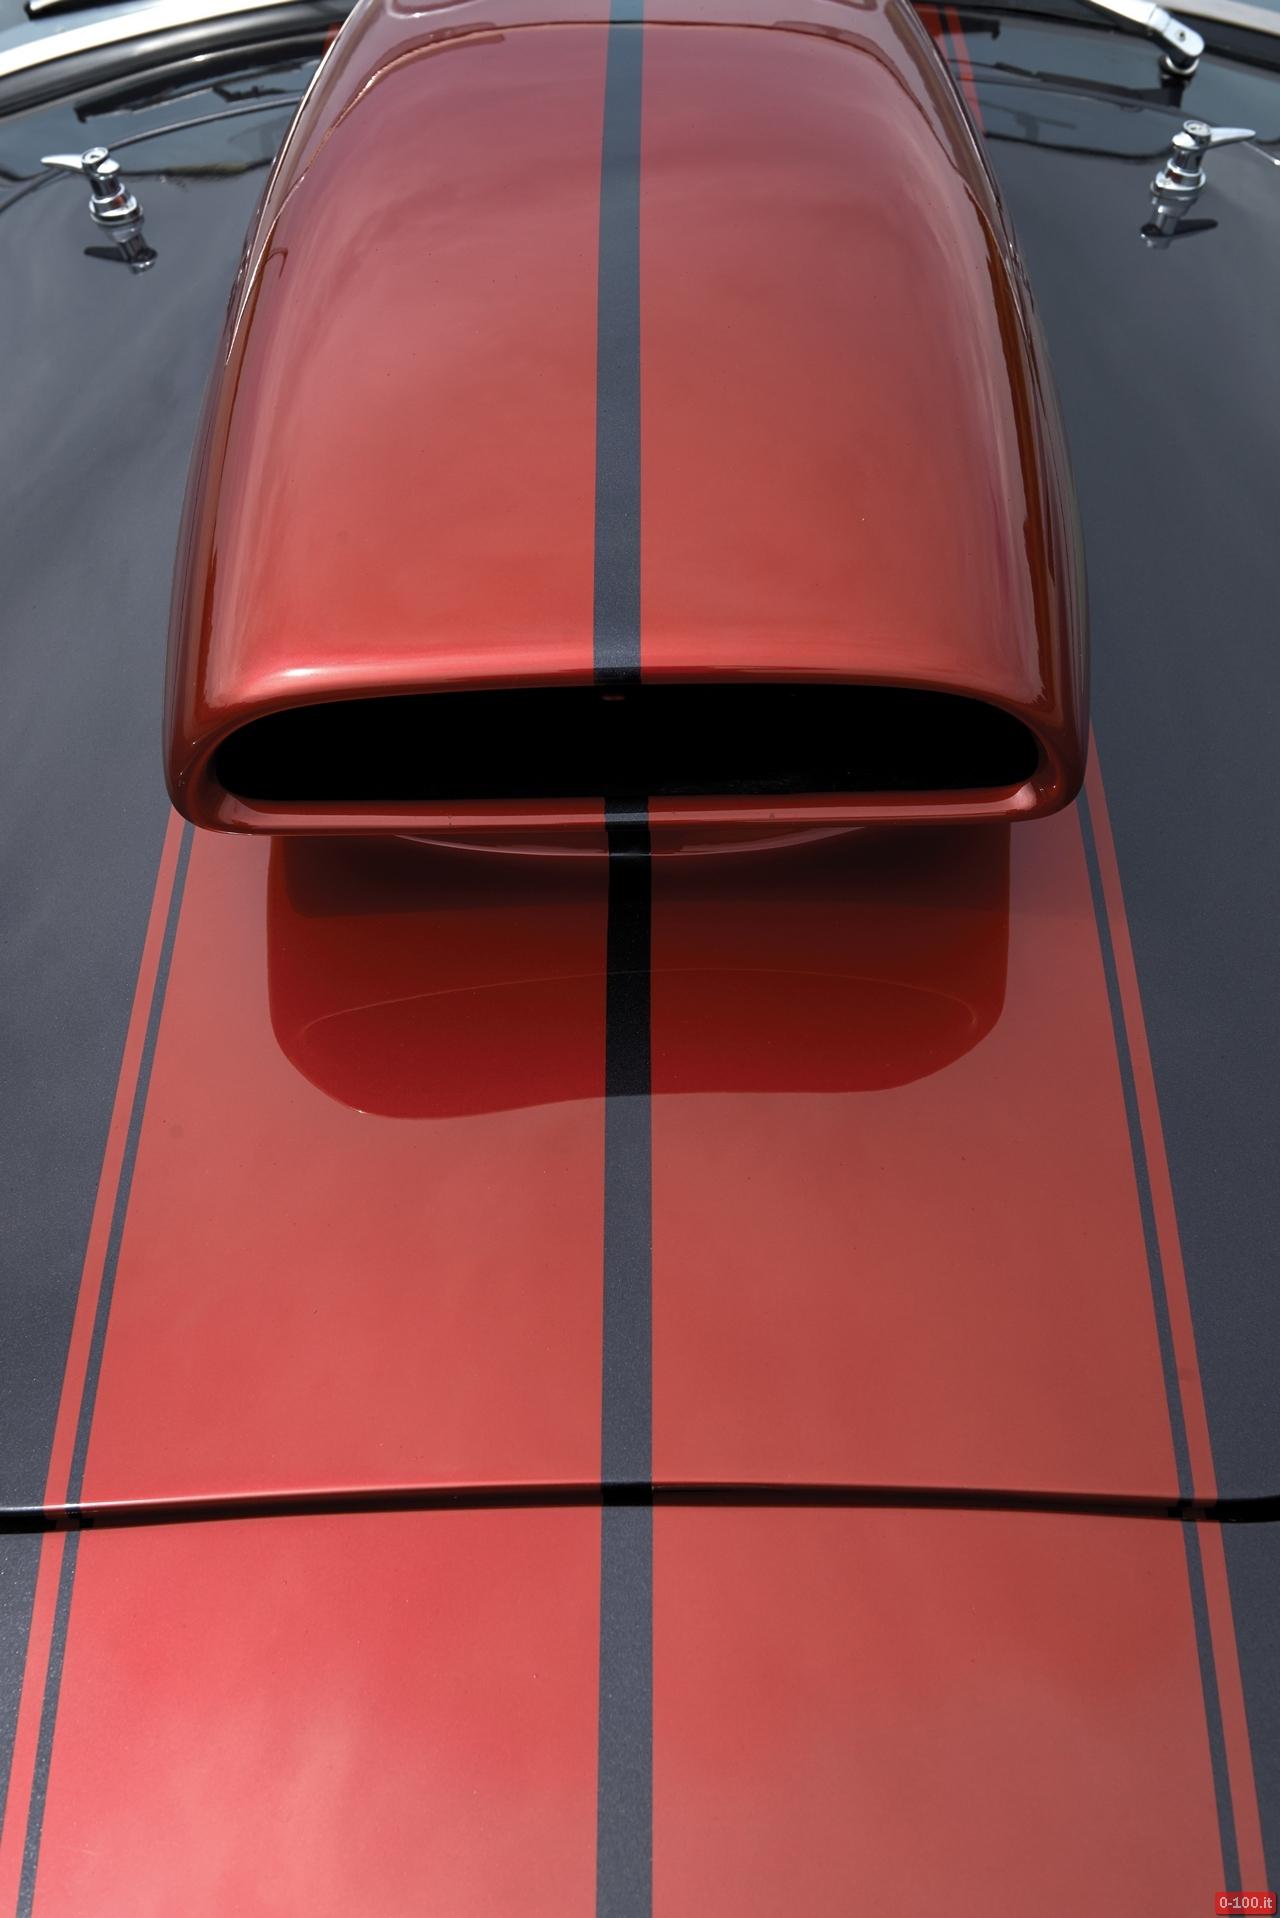 rm-auctions-a-retromobile-2014-weineck-cobra-780-cui-limited-edition-0-100_16